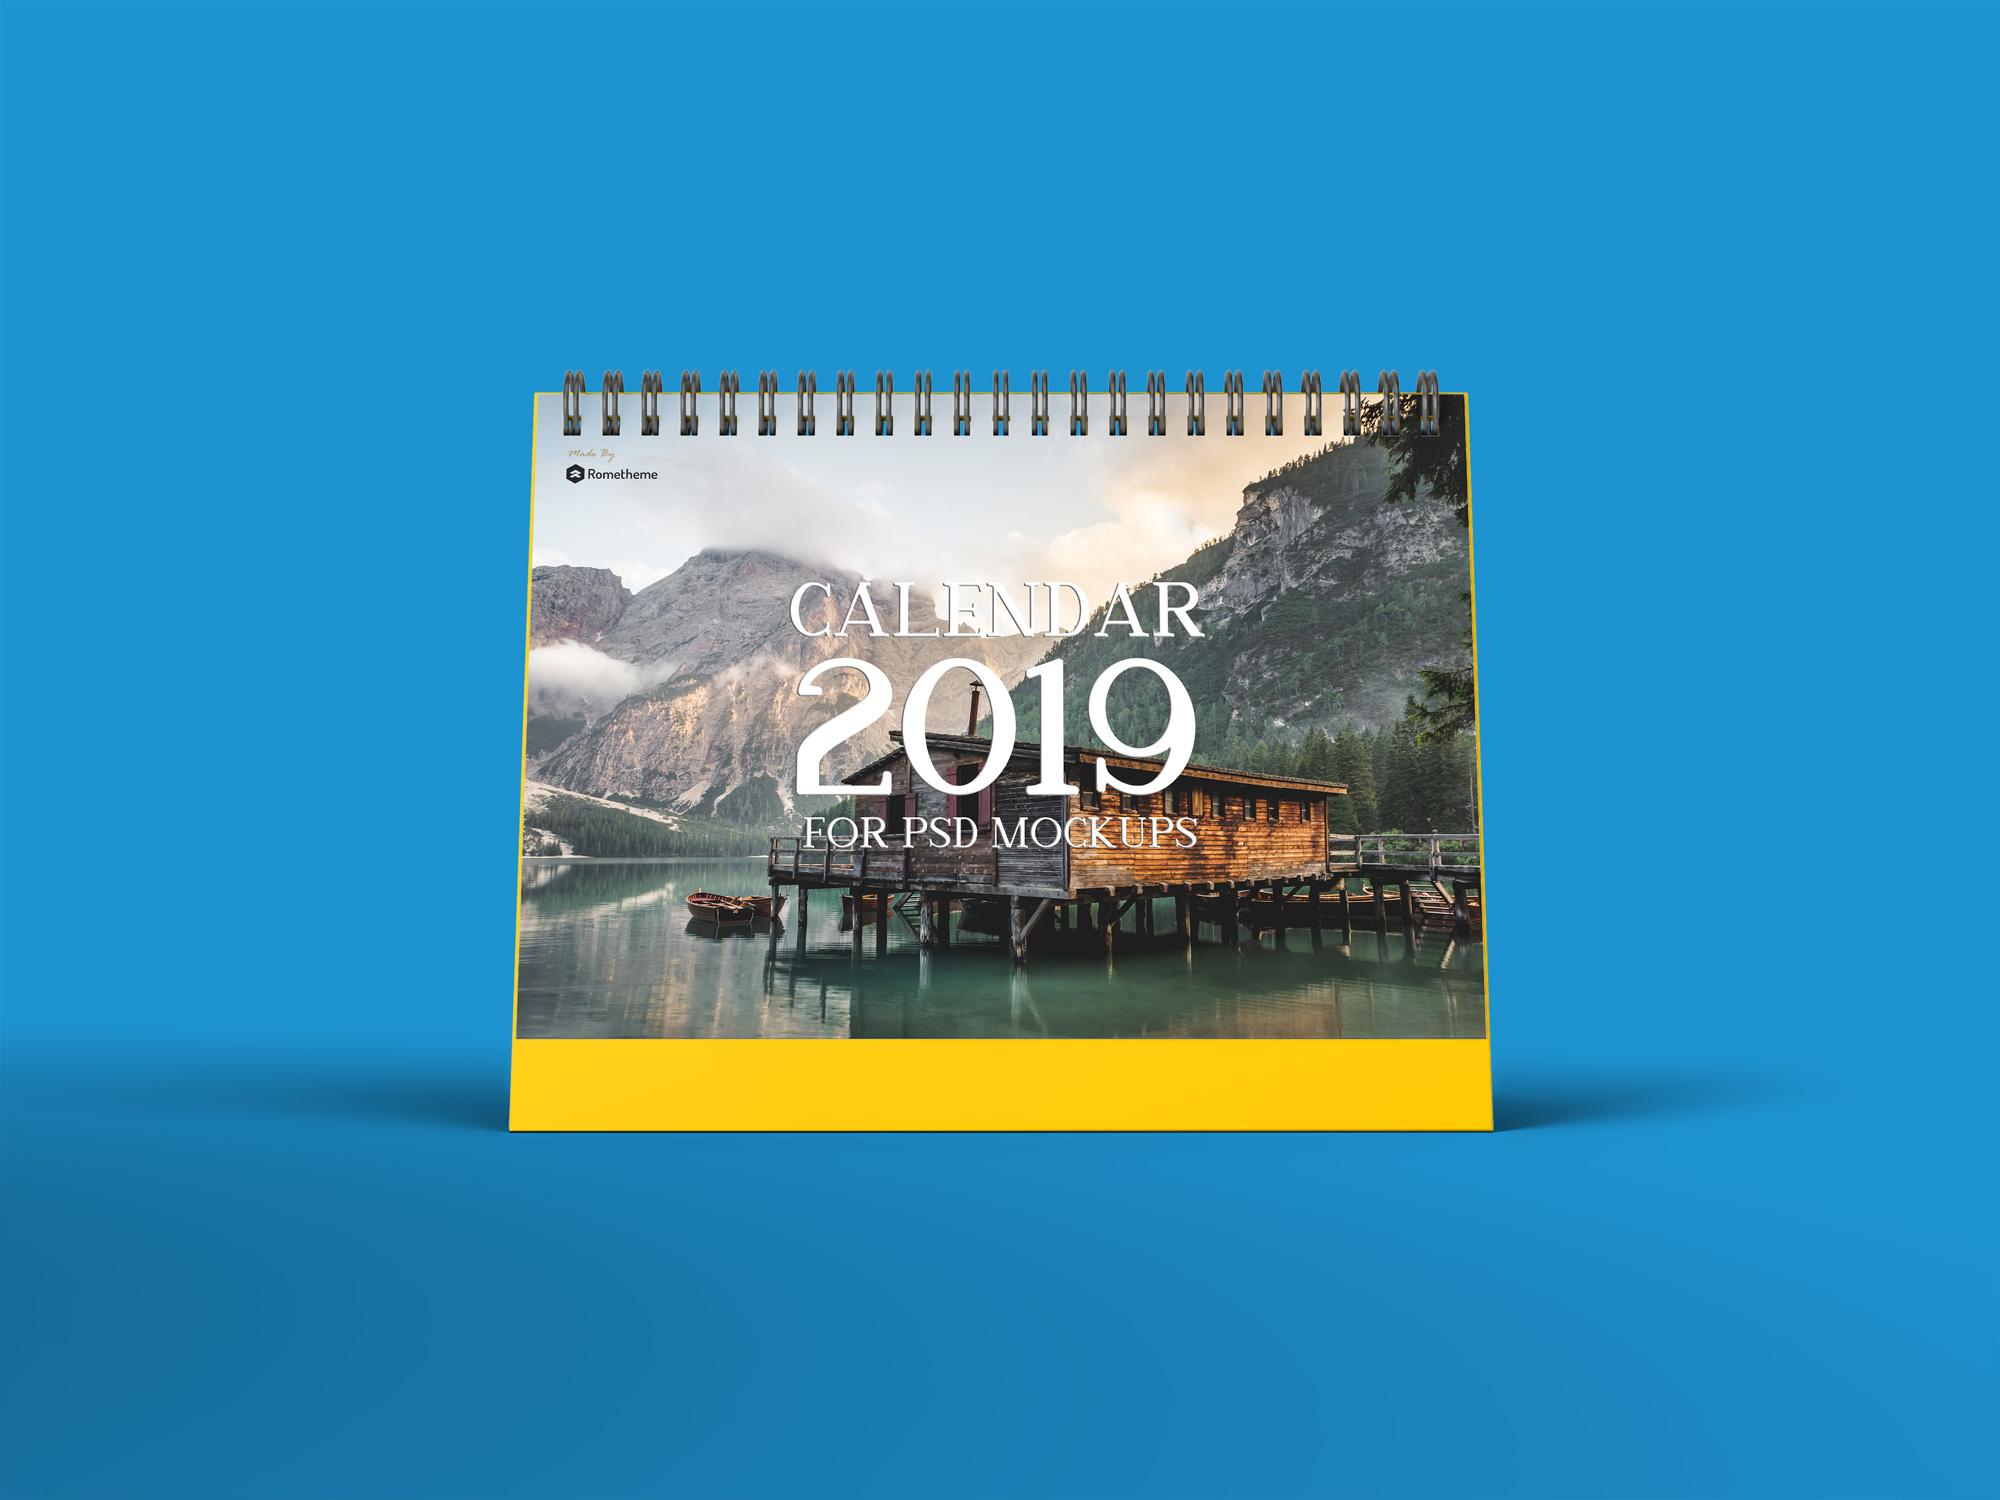 Calendar Table Mockups vol.1 example image 2